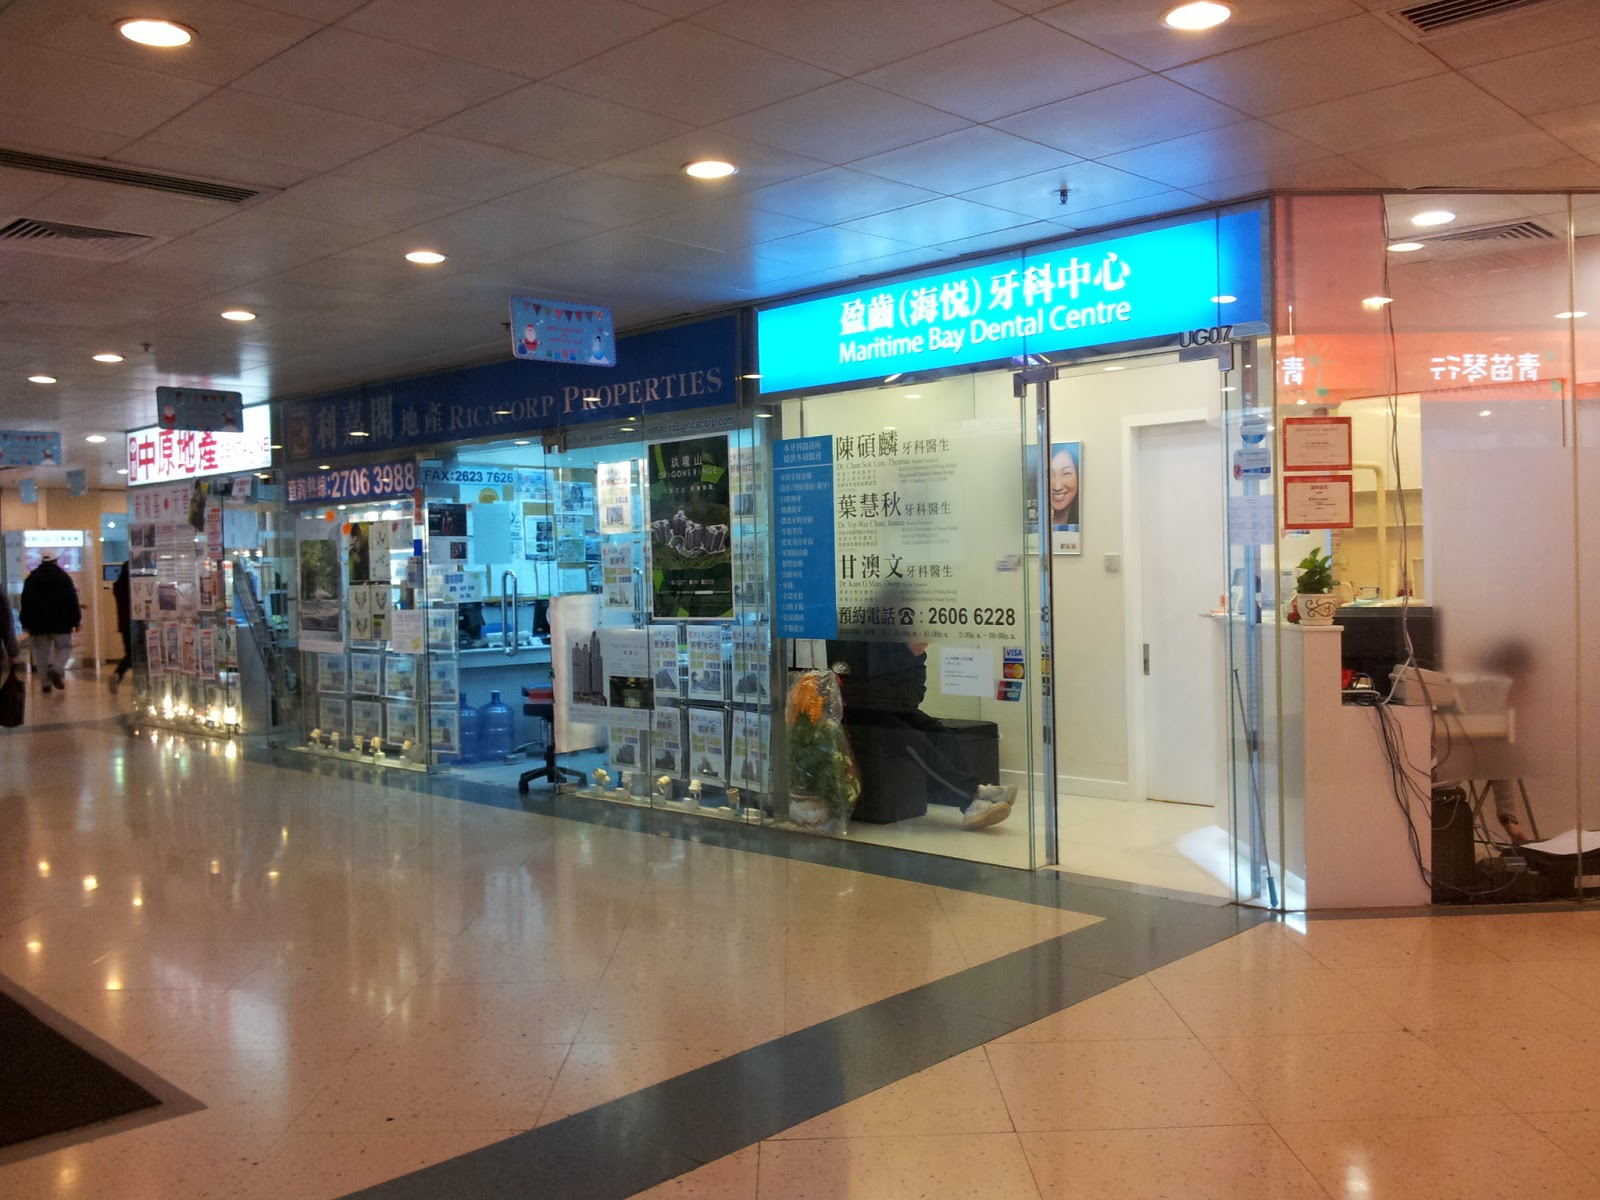 Grassroots O2: 巡視業務.領匯.海悅豪園購物商場 @2014-12-13